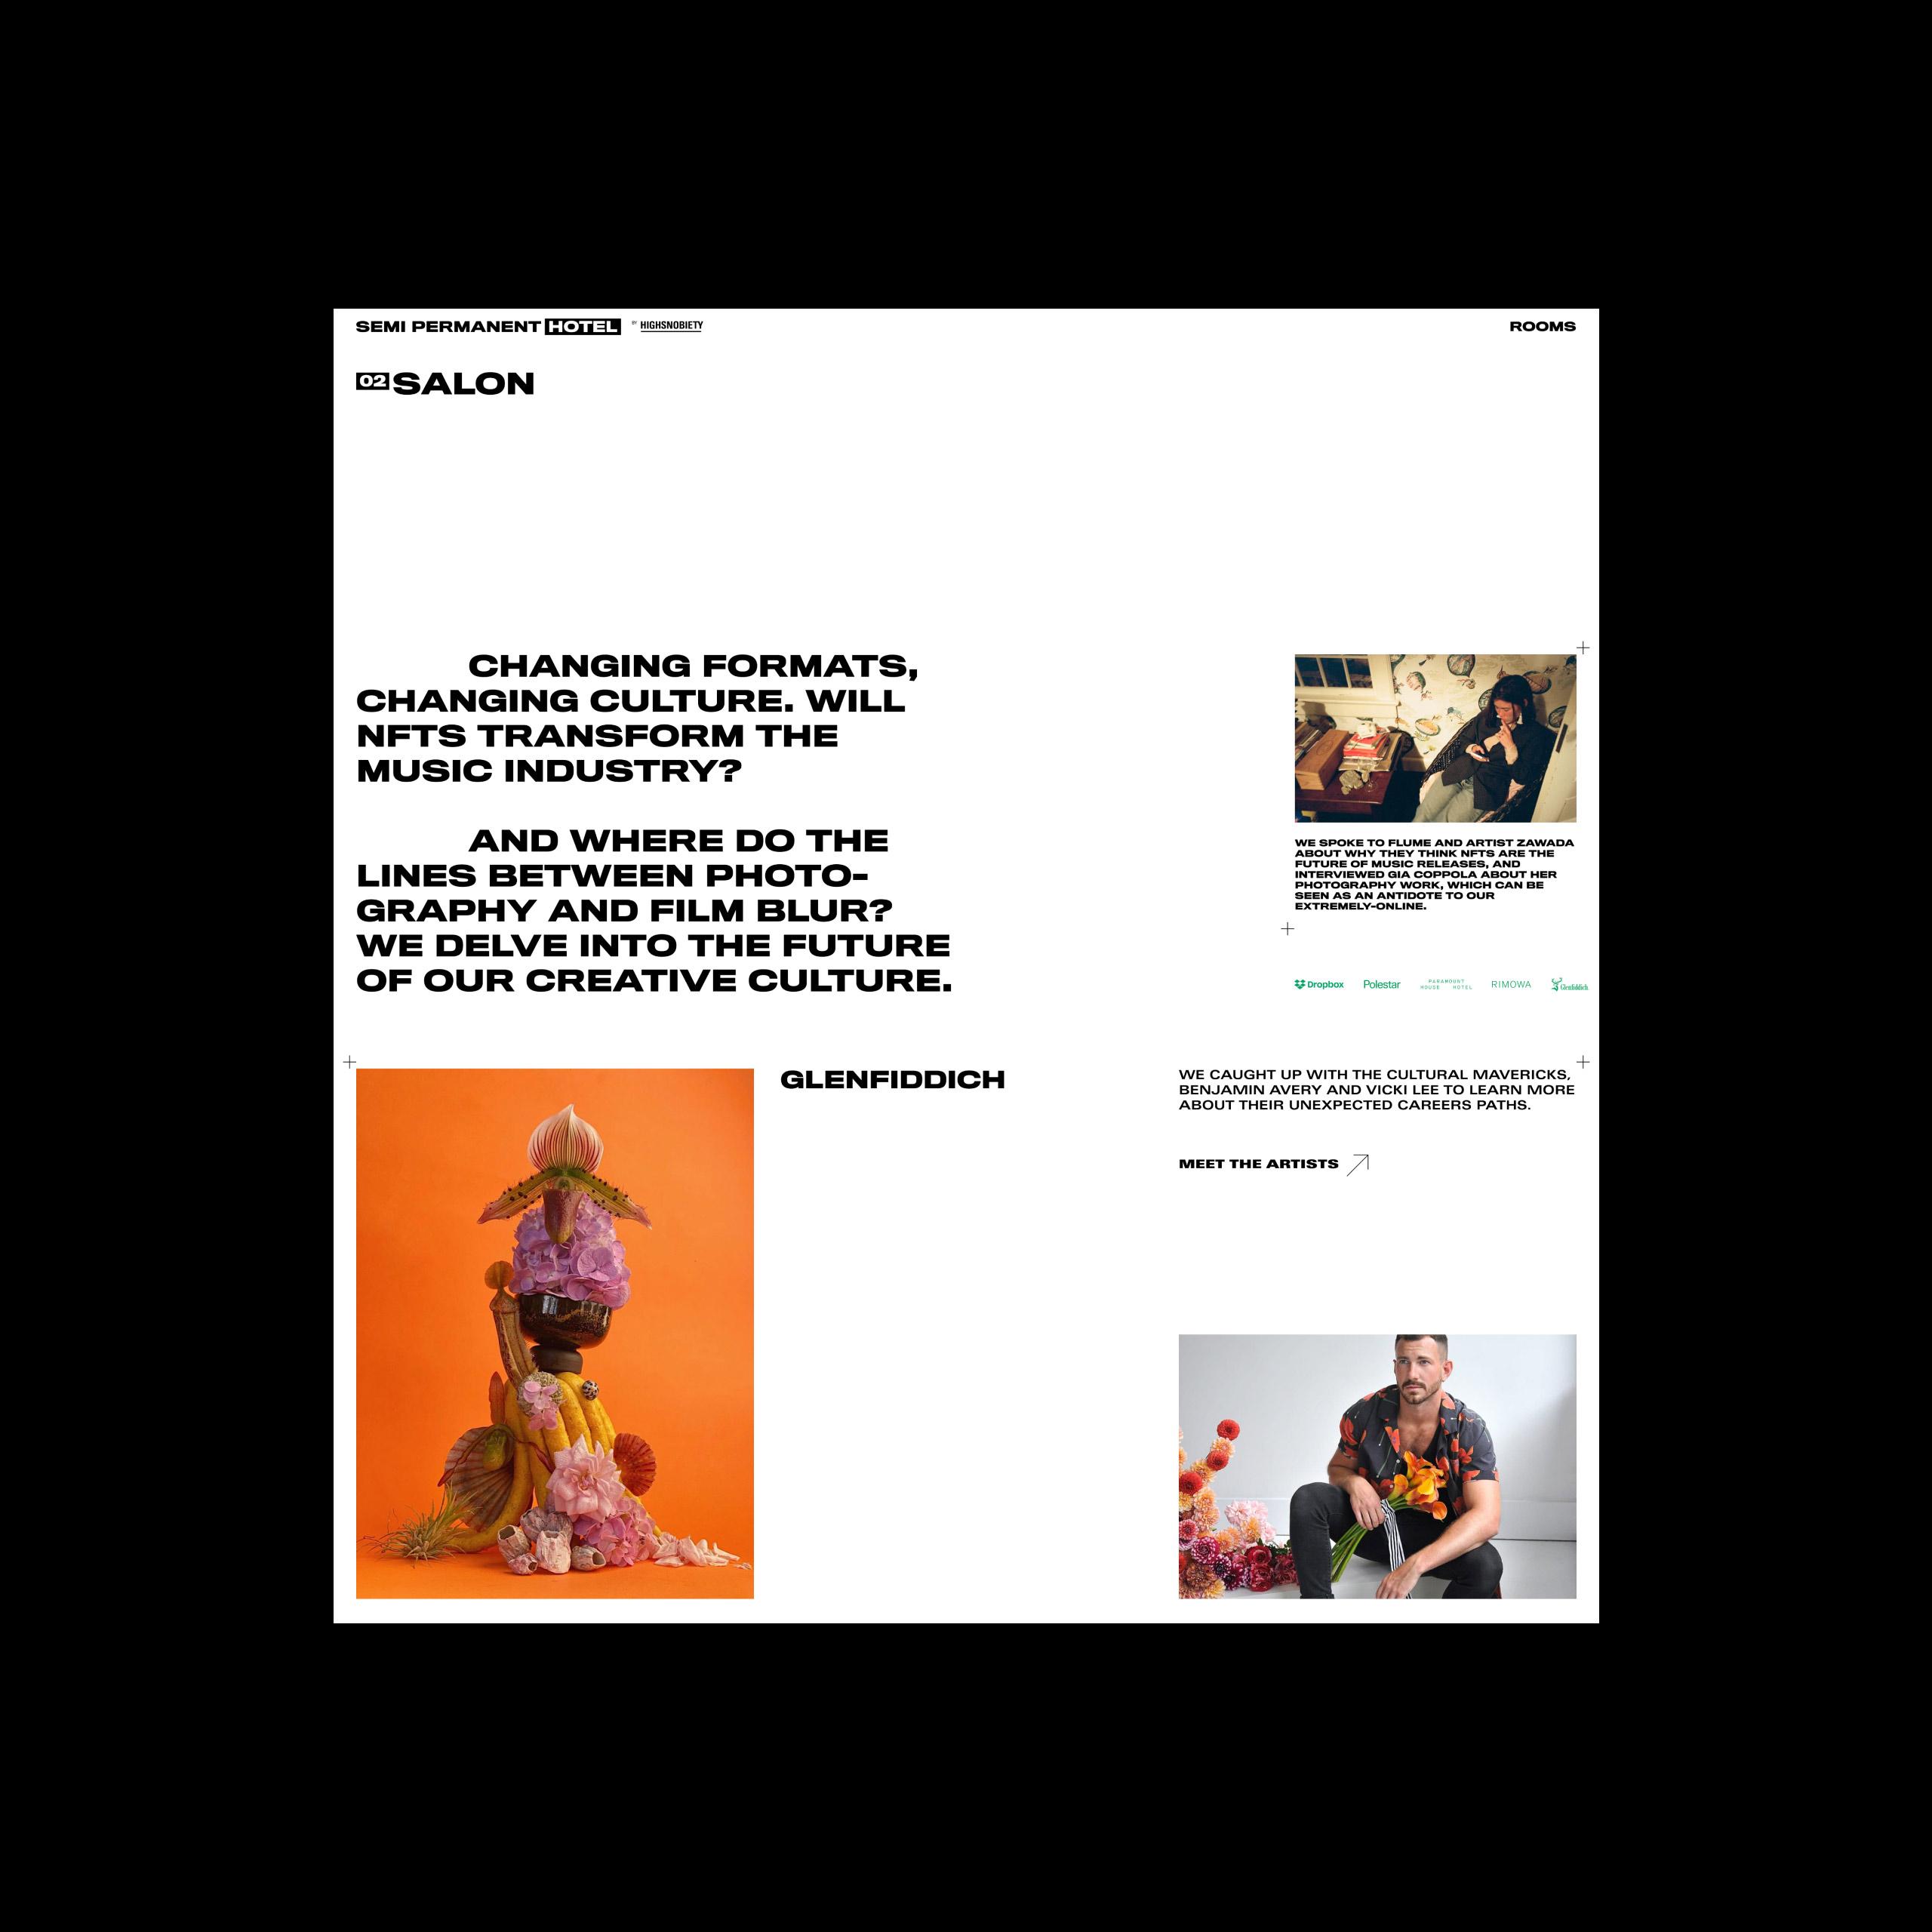 Semi Permanent Hotel - Website Artists